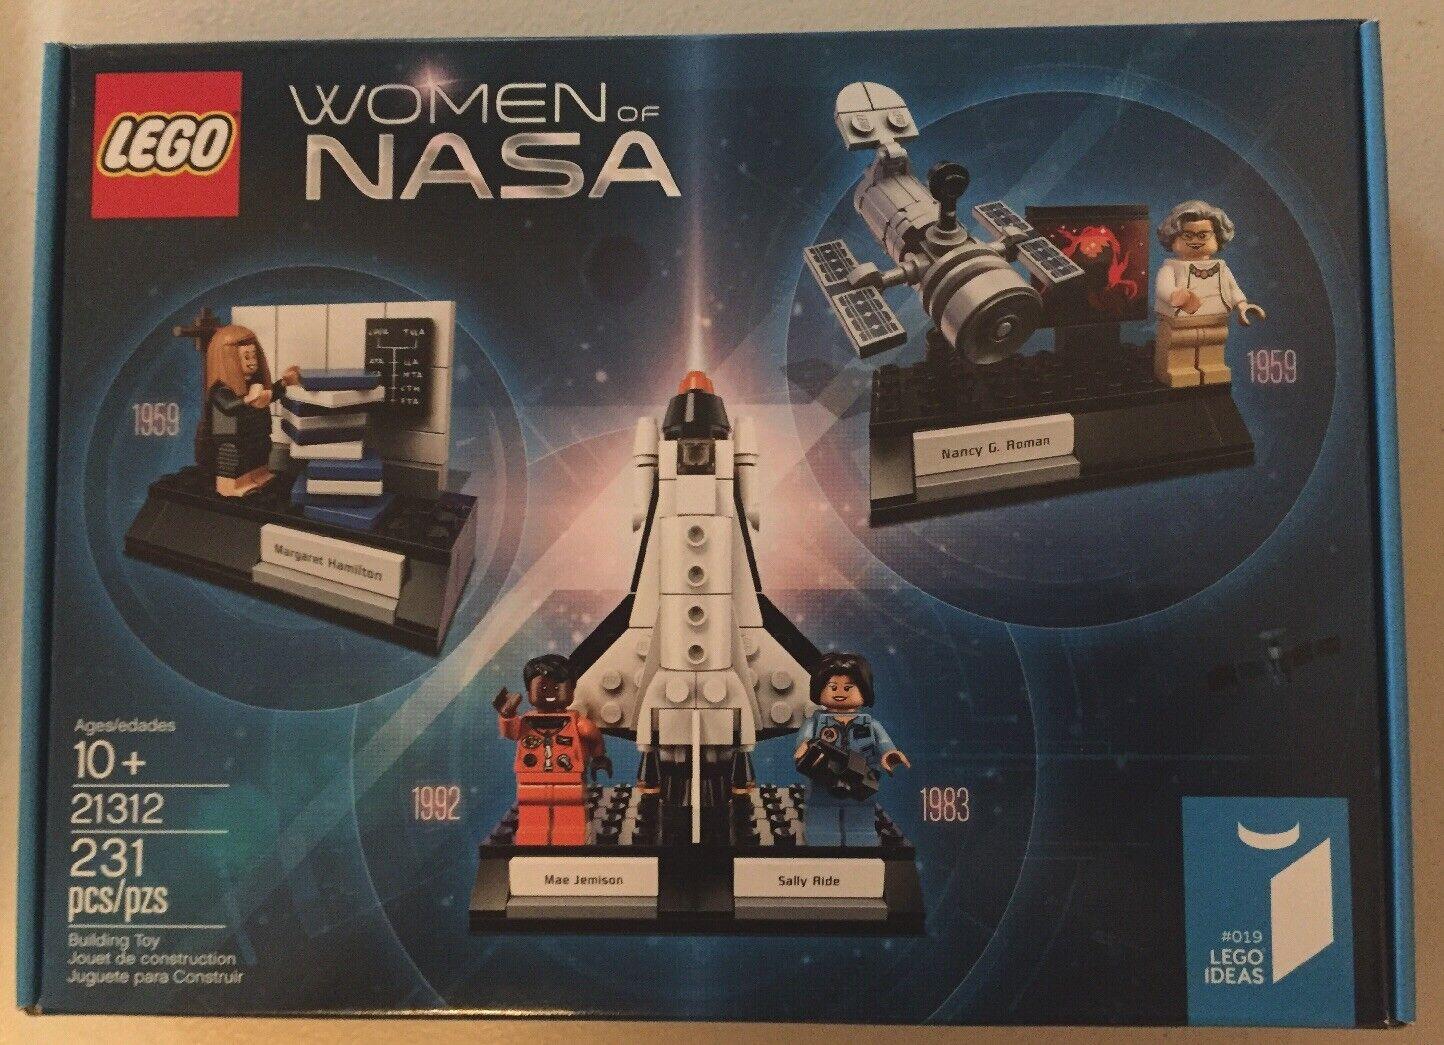 LEGO IDEAS Women of Nasa 21312 Building Kit Kit Kit (LEGO 21312) New, Unopened, Complete d0732b